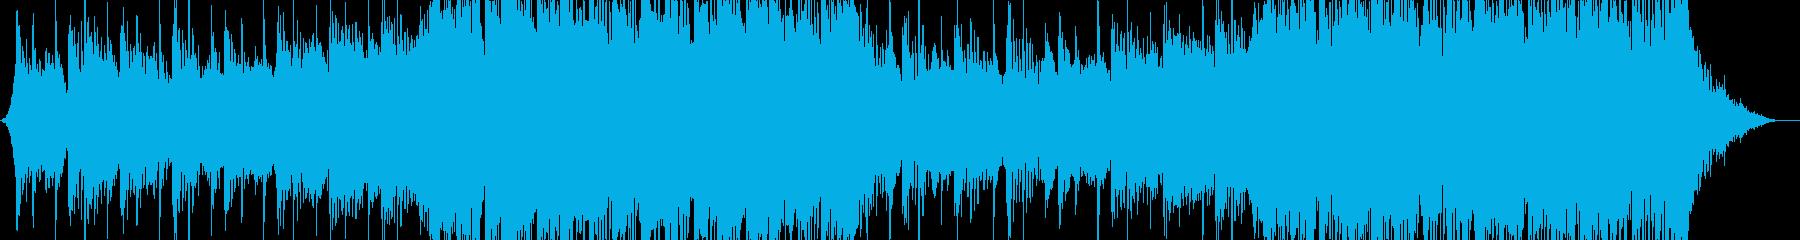 Hollywood Orchestra 3の再生済みの波形